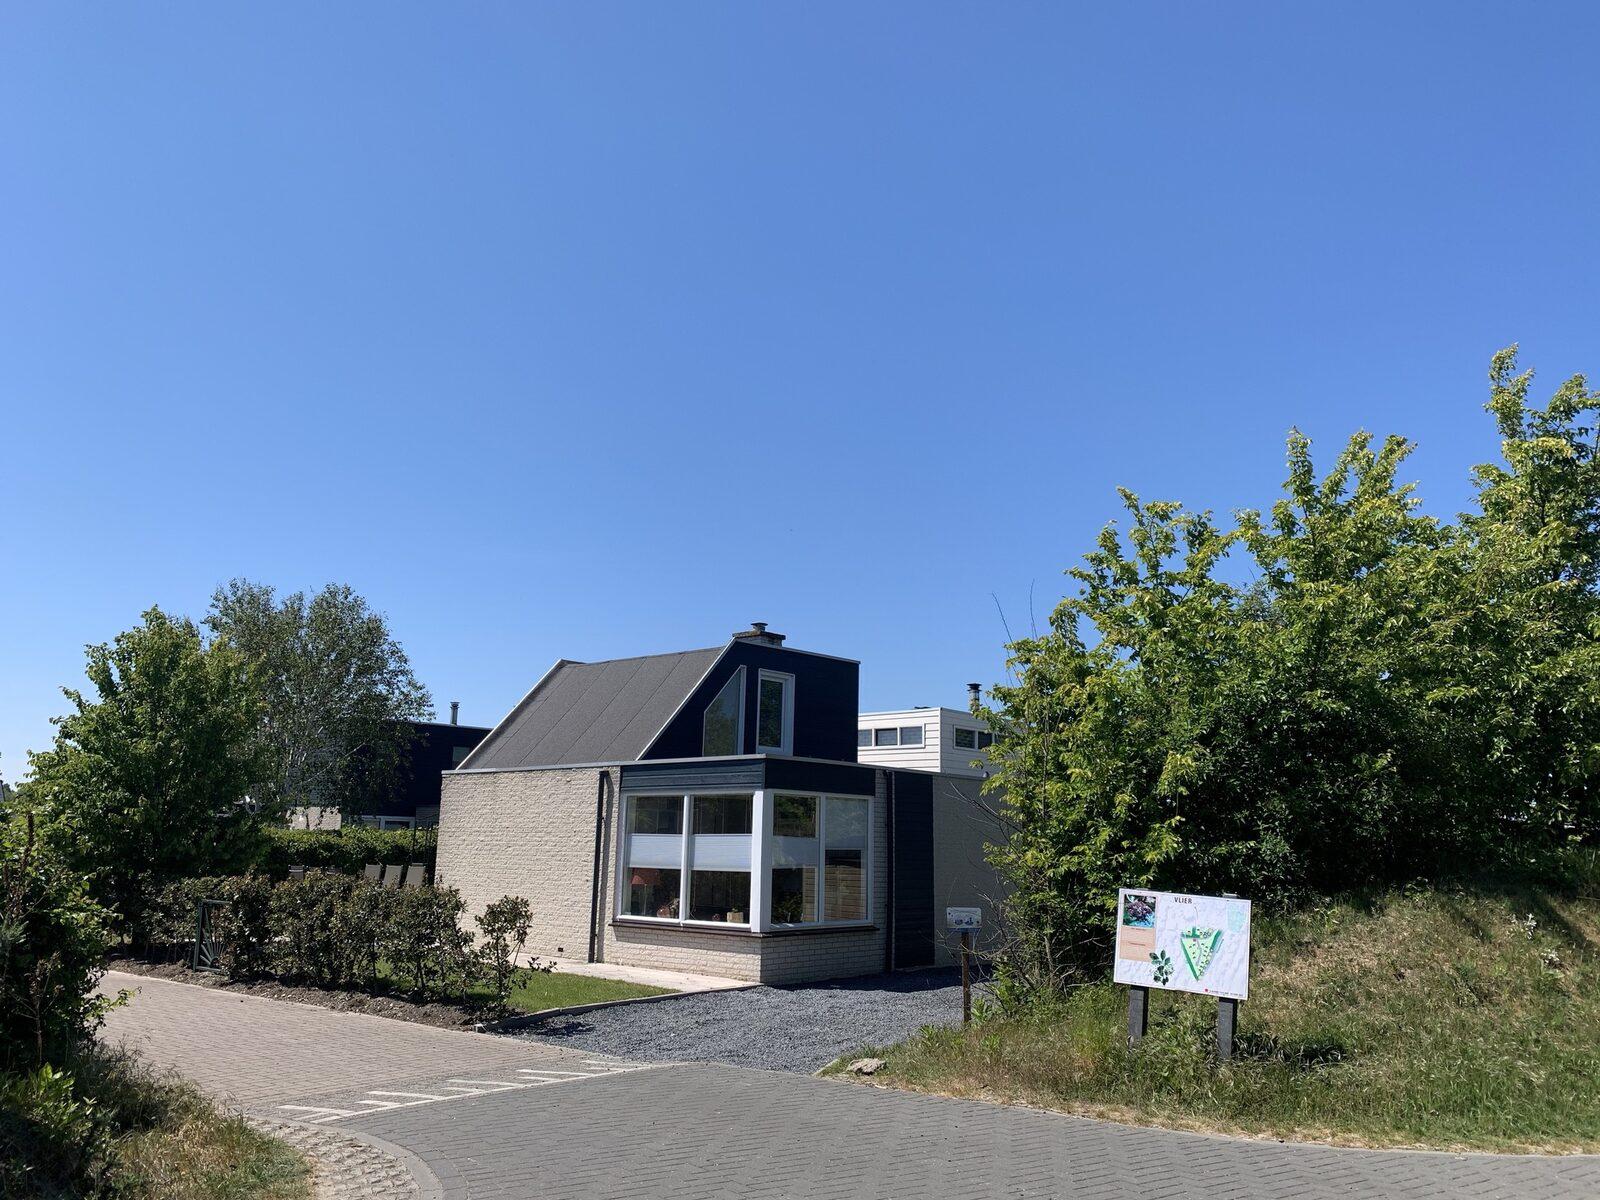 Vlier 1 - Klepperstee Ouddorp